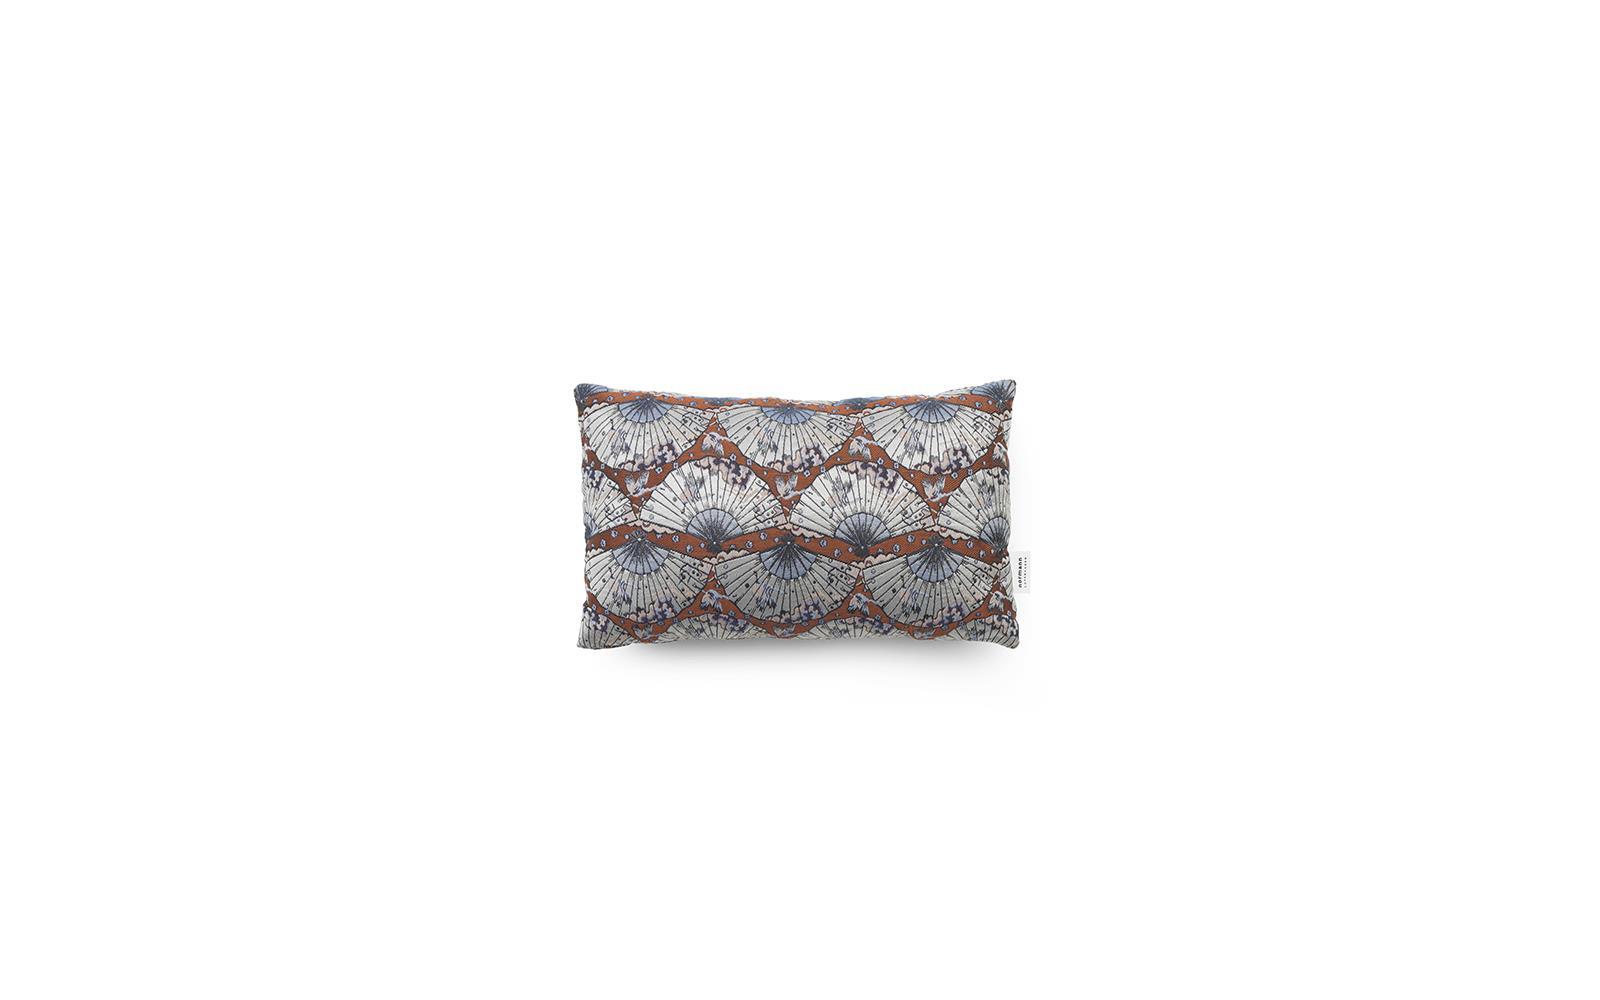 Details about  /Precor Deck Cushion